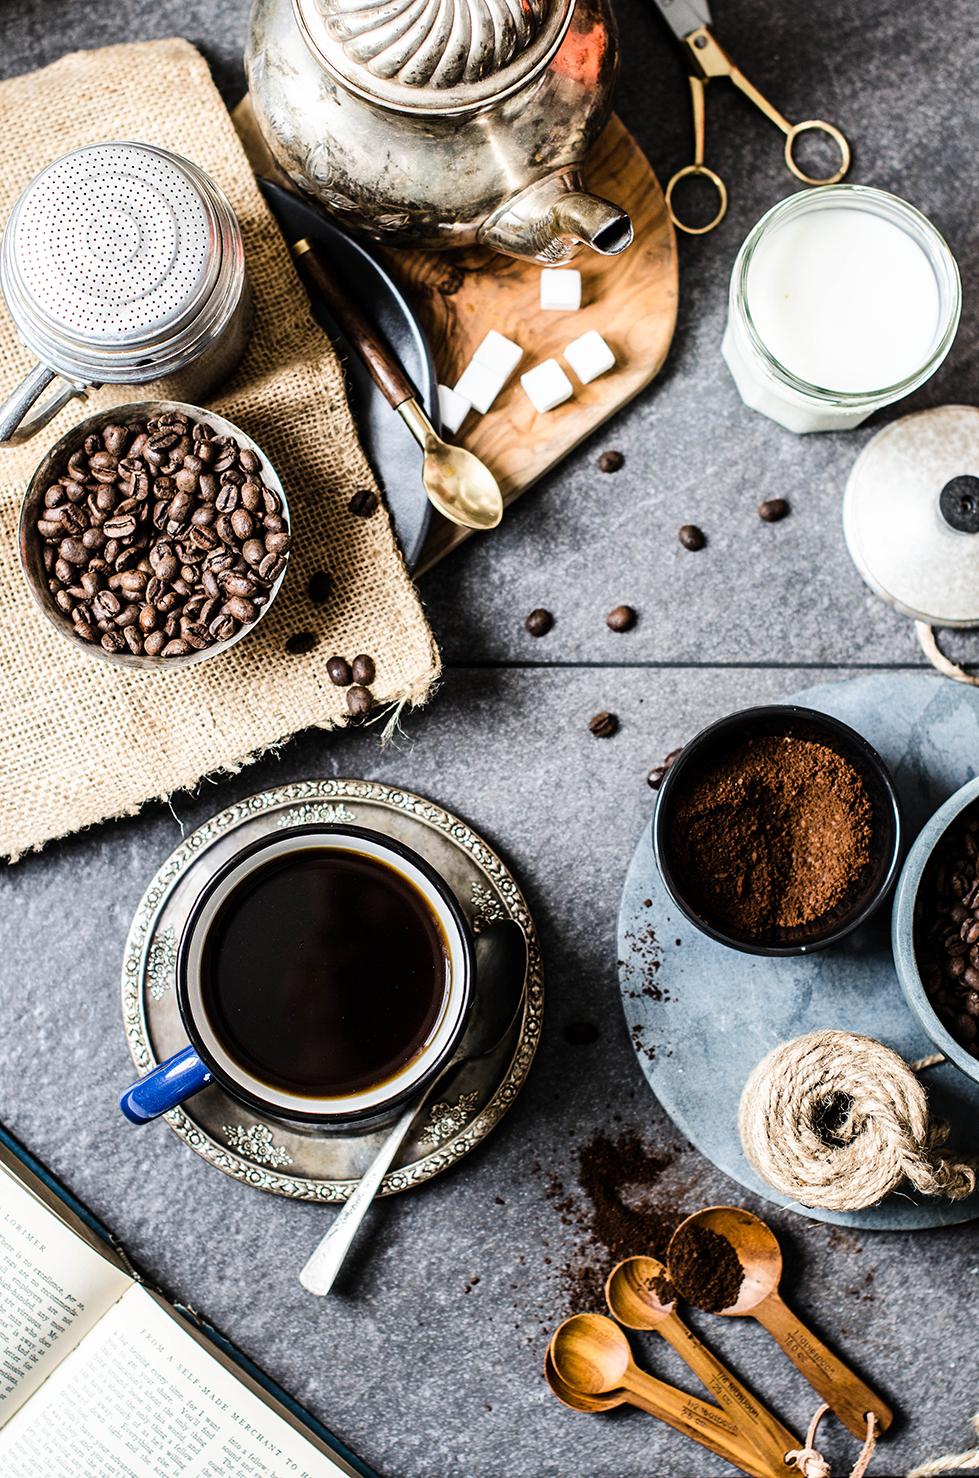 ROSE+&+IVY+Journal+Winter+2015+The+Coffee+Ritual.jpg